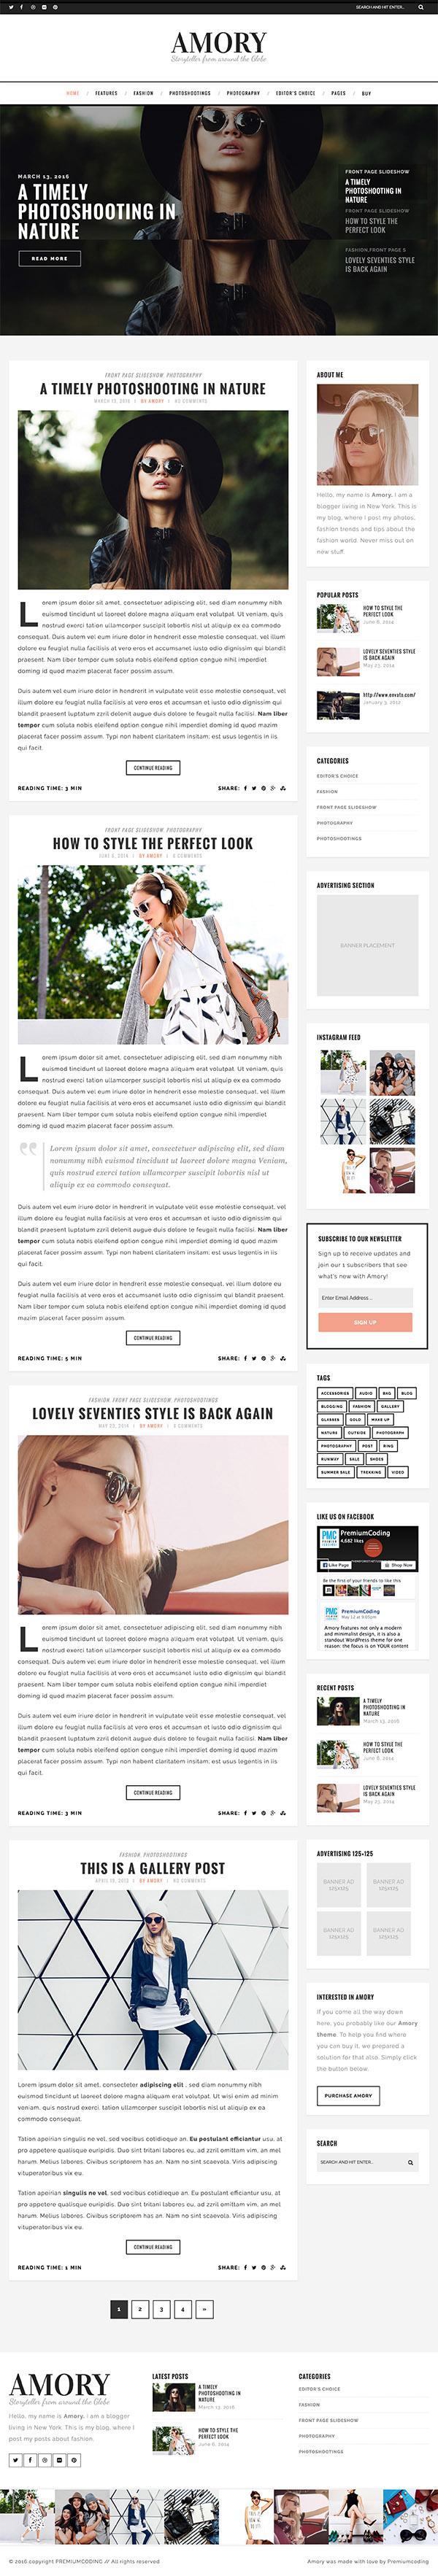 01 Amory - Premium WordPress Blog Theme